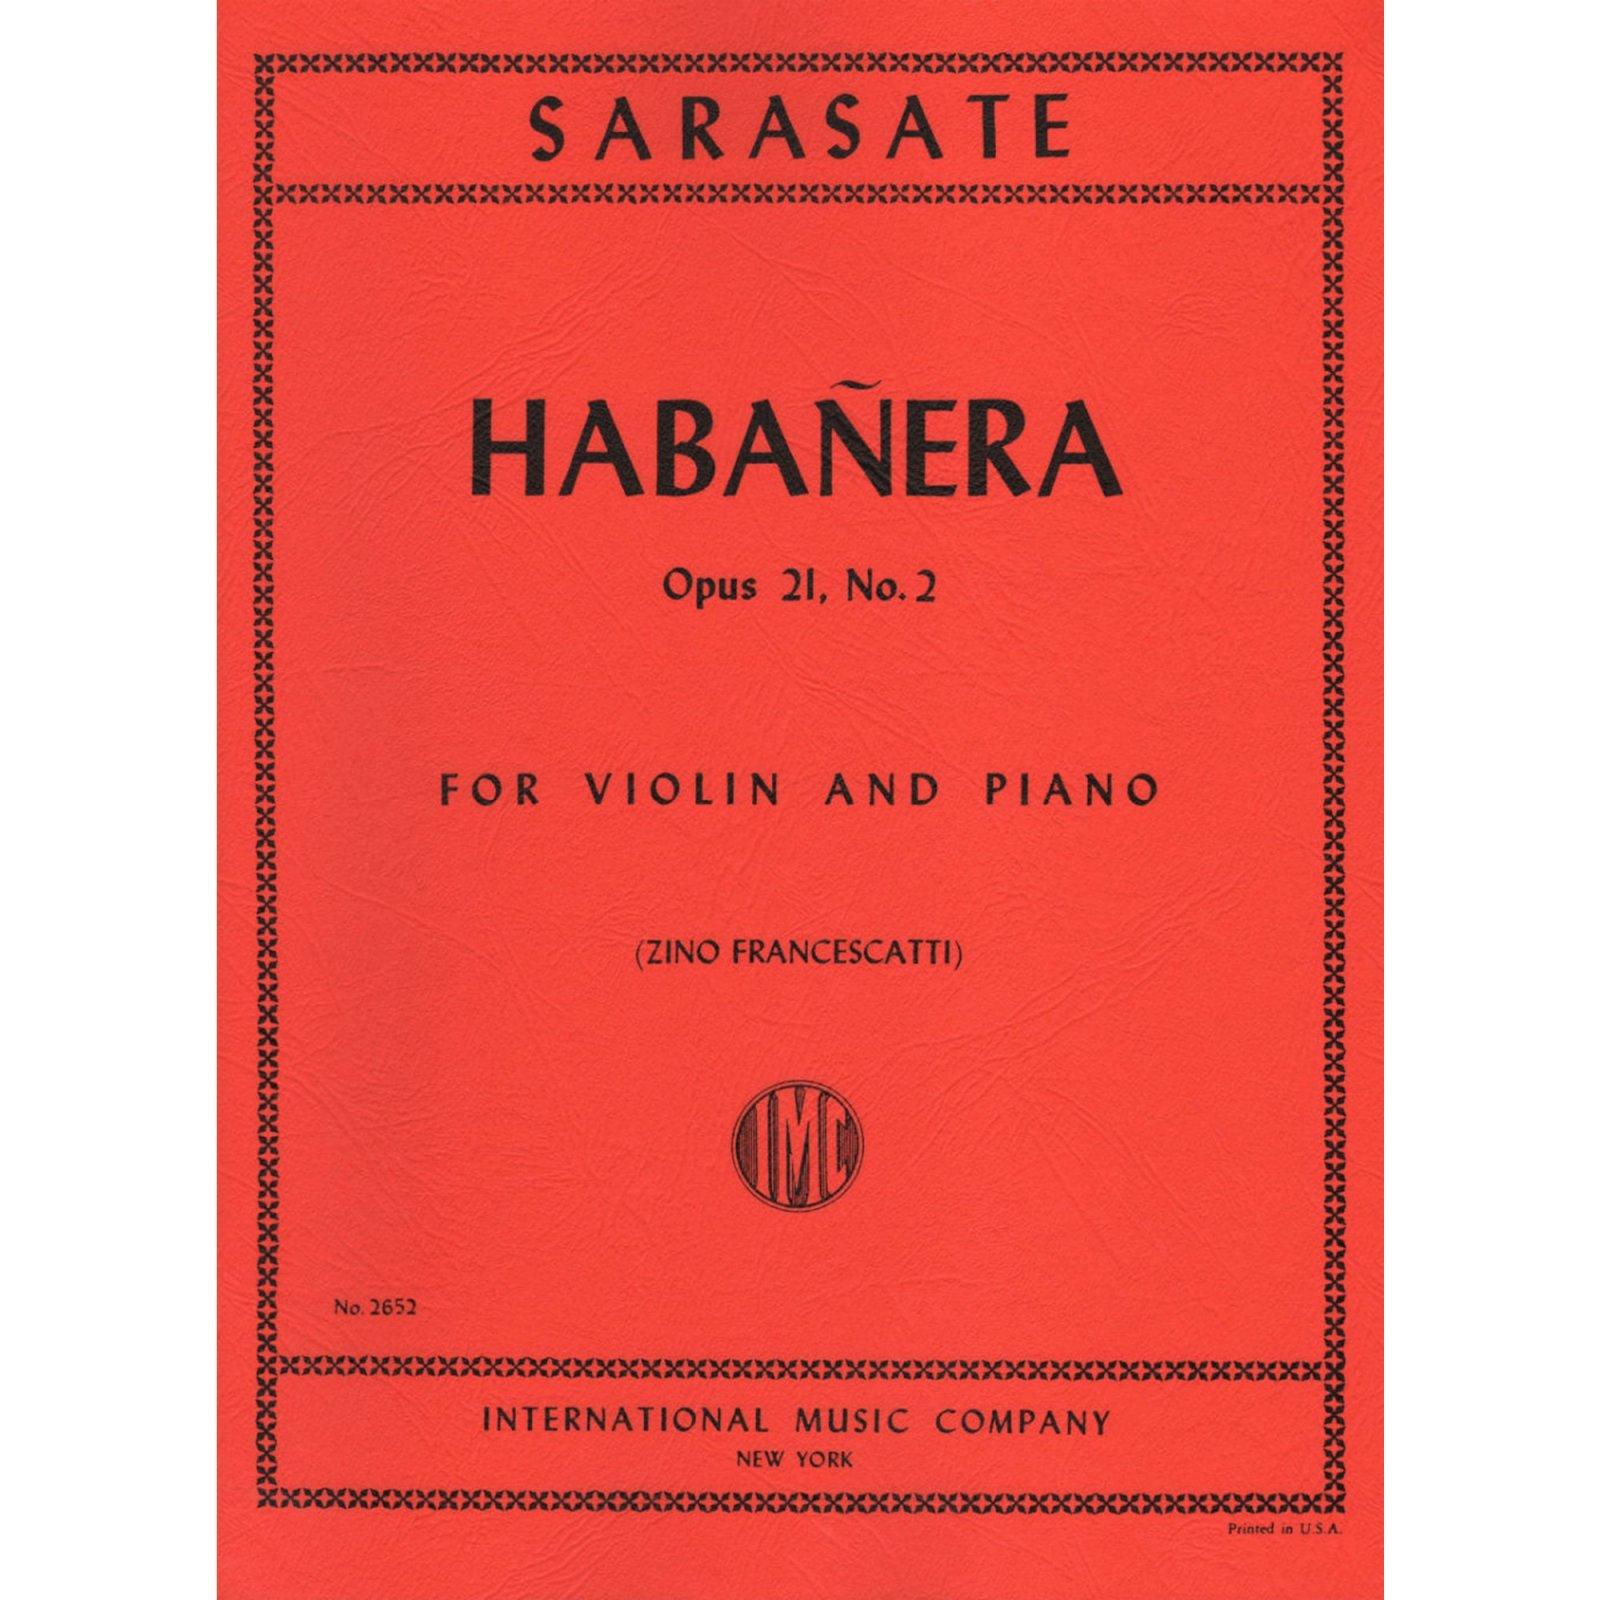 Sarasate: Habanera Op. 21 No.2 Ed. Francescatti